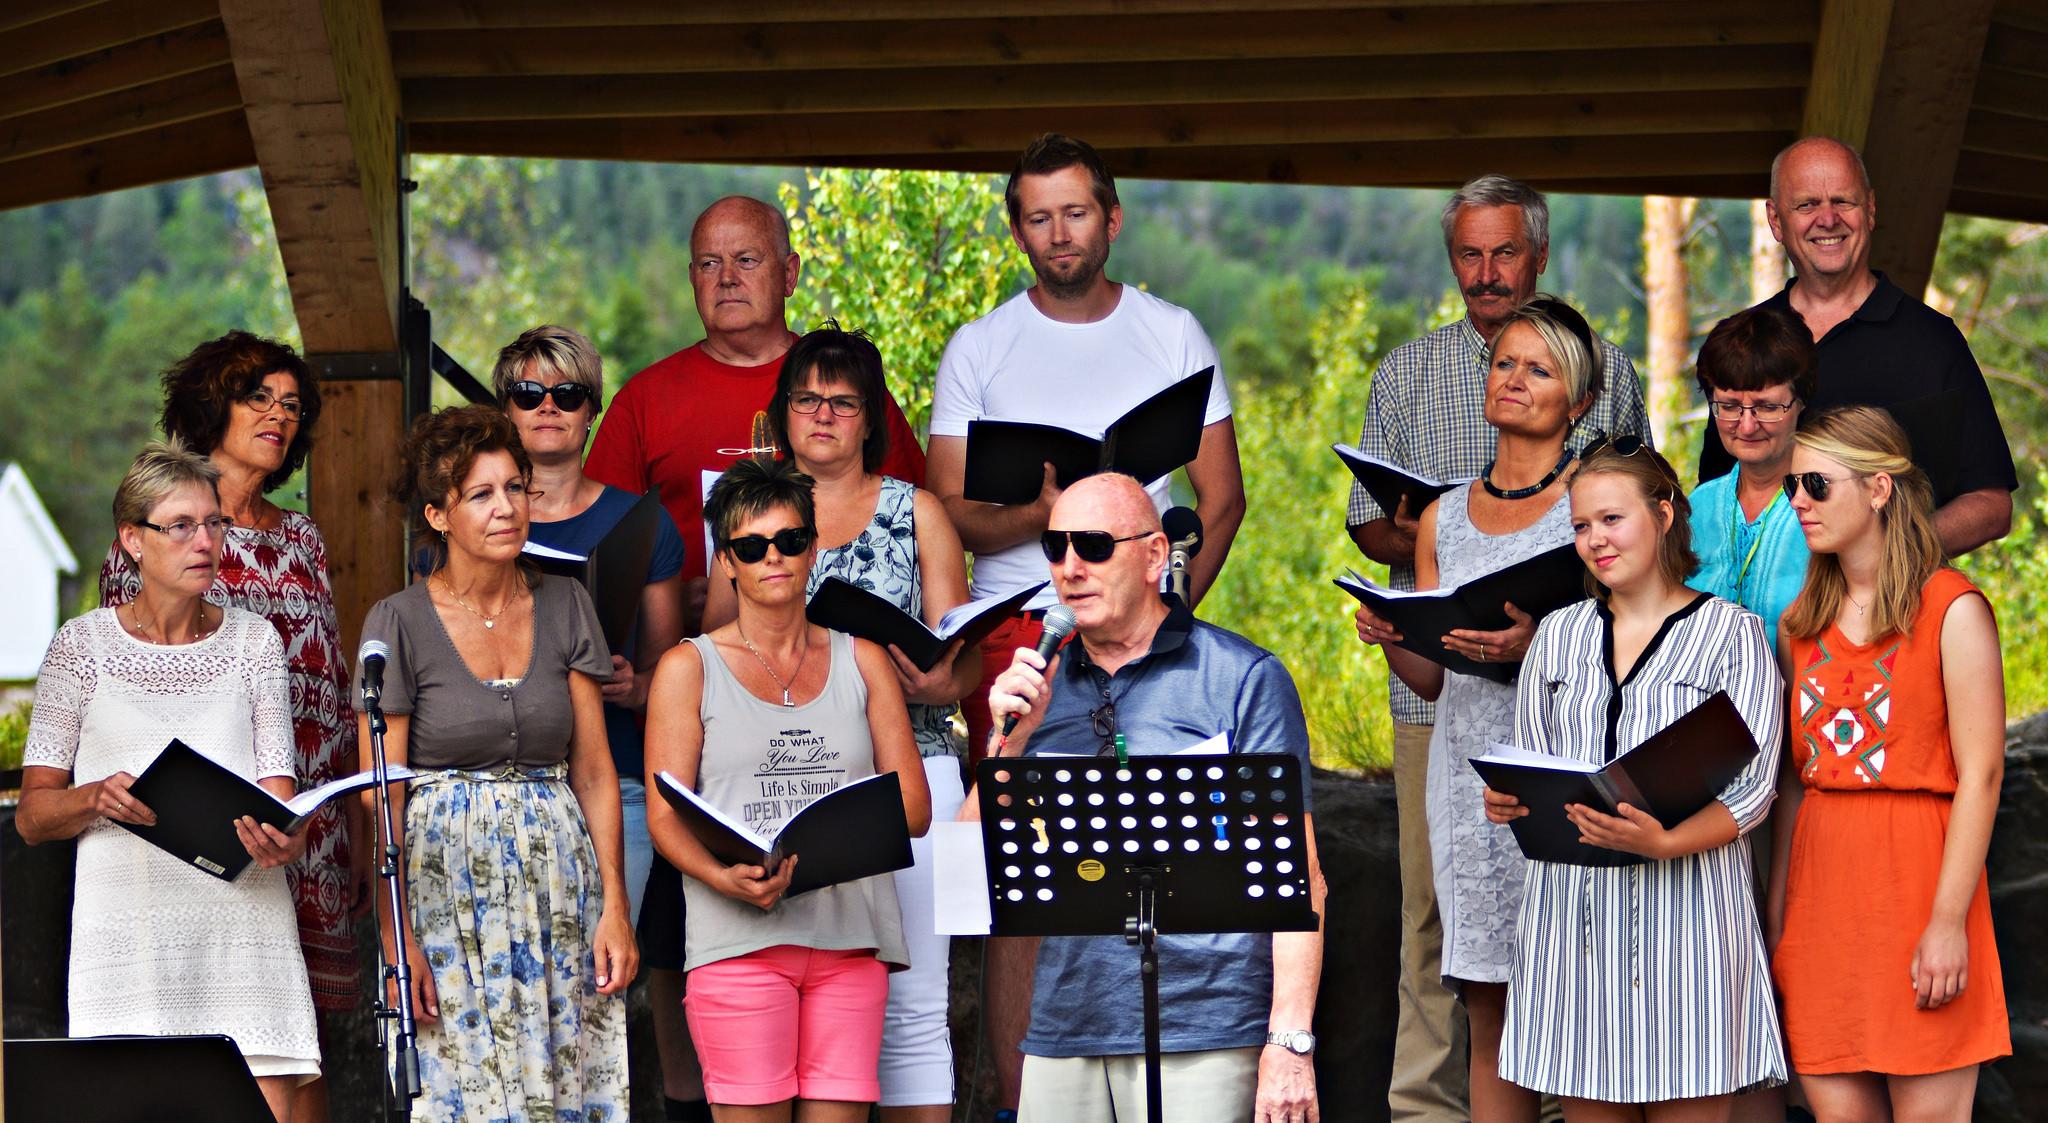 Friluftskonsert Furuly fritidspark Evje juni 2016. Foto Geir Dåsvatn